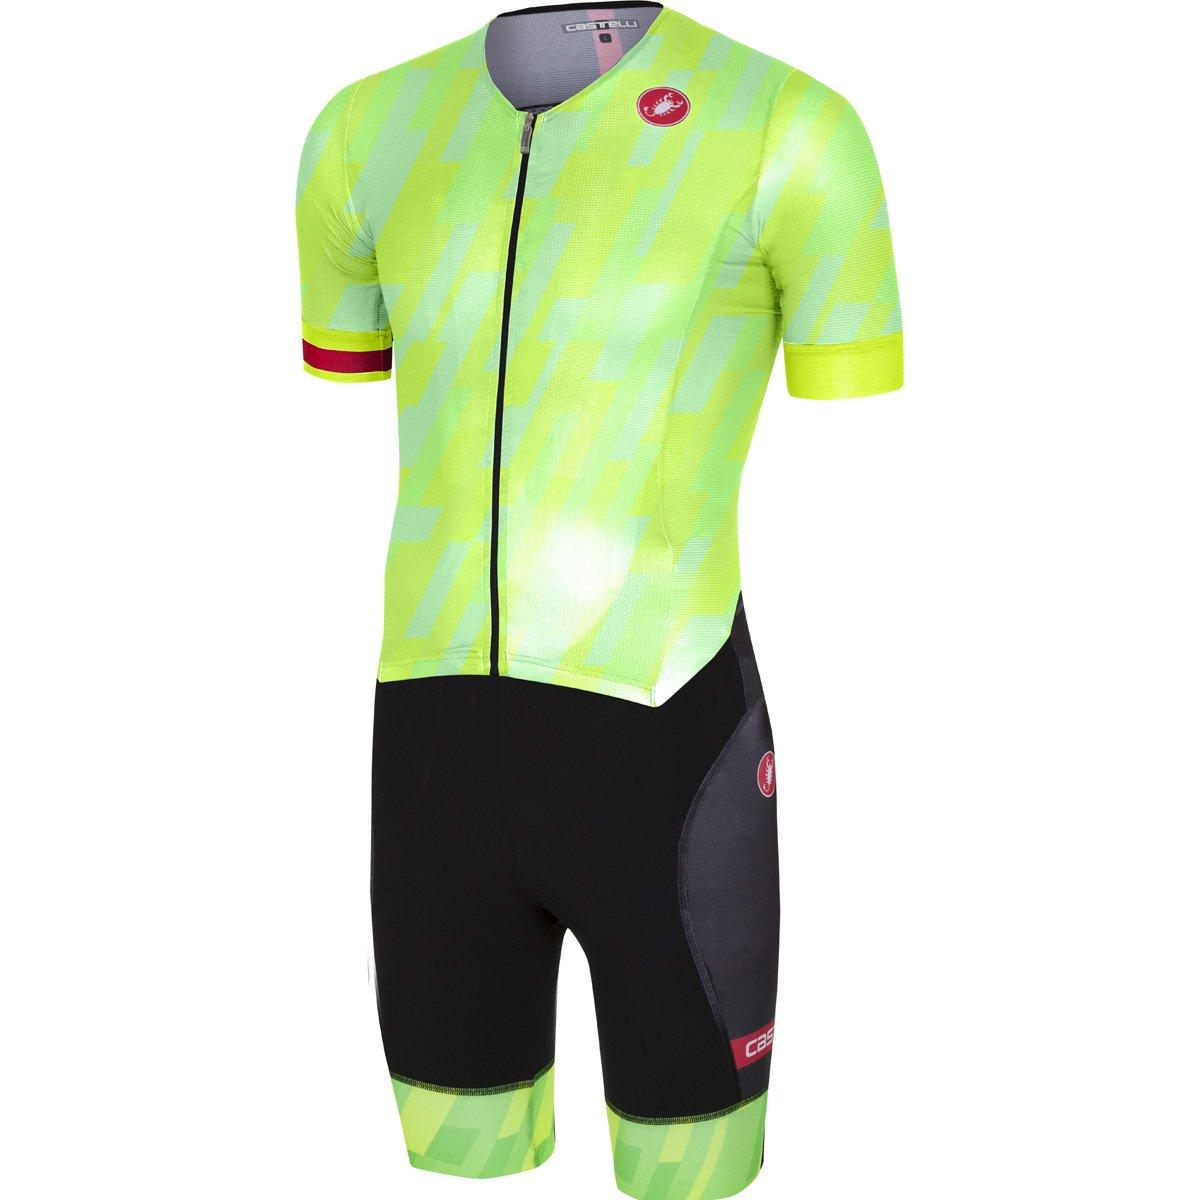 CastelliメンズFree Sanremo Short Sleeve Tri Suit XX-Large Pro Green B079RL2ZWZ